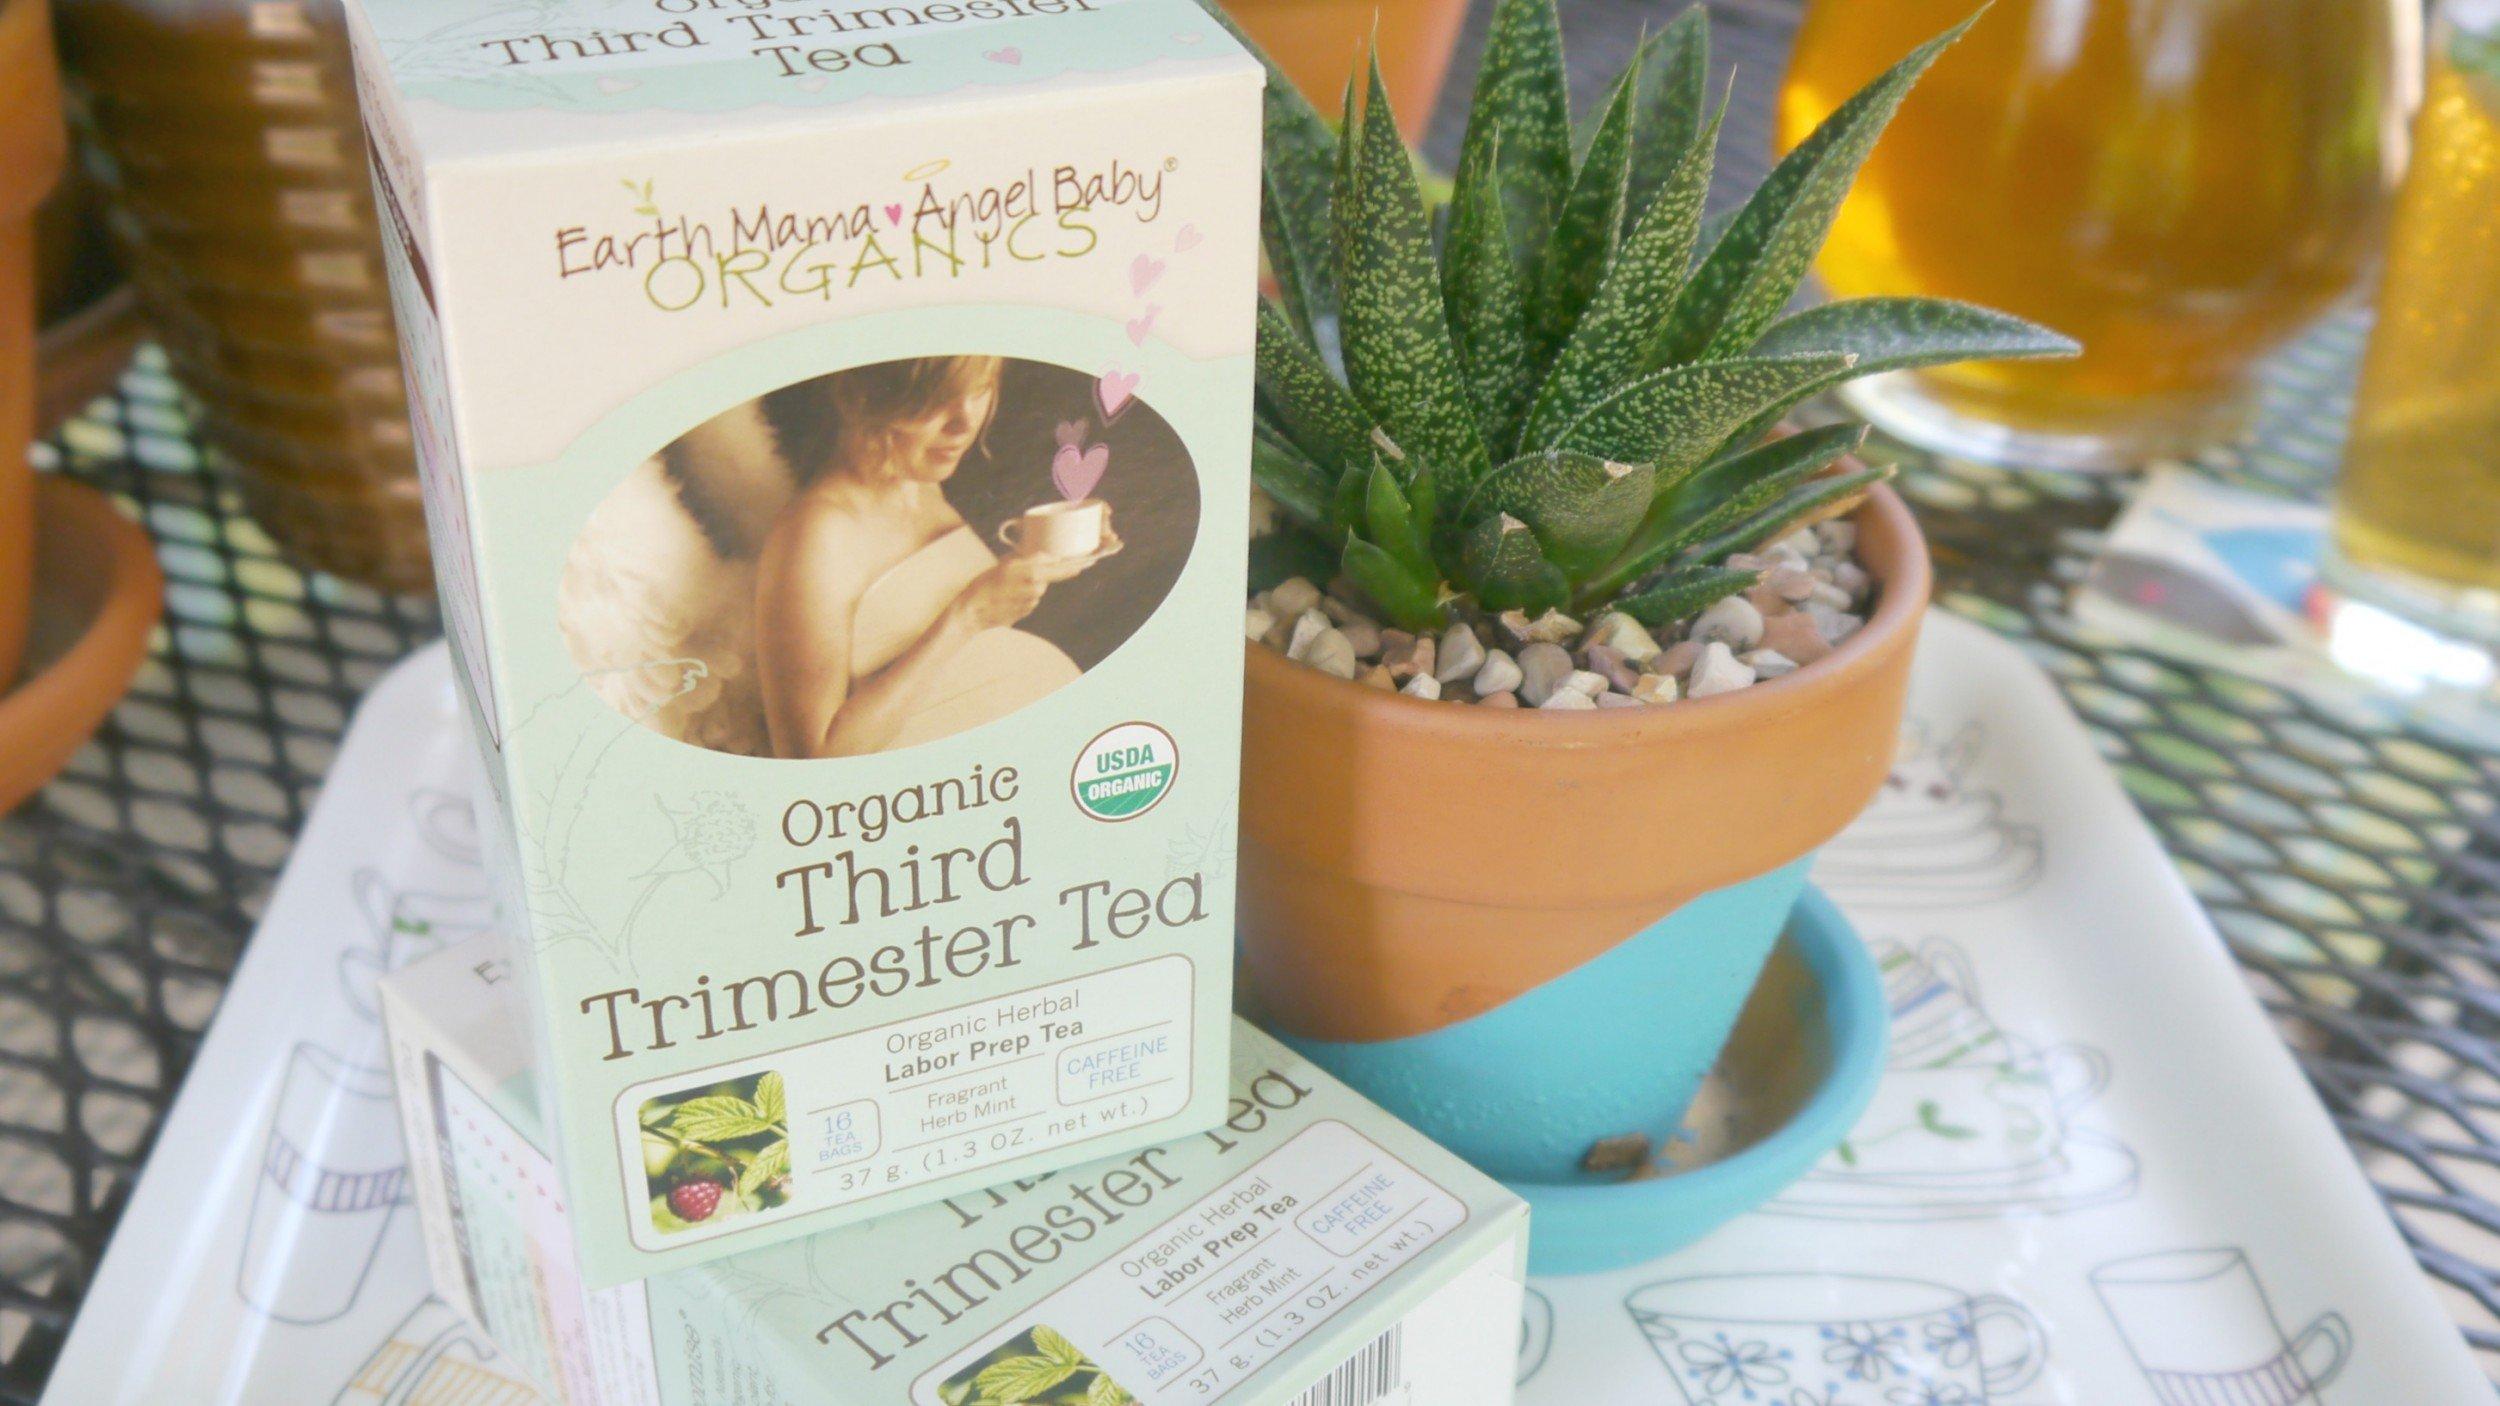 3rd trimester tea 3